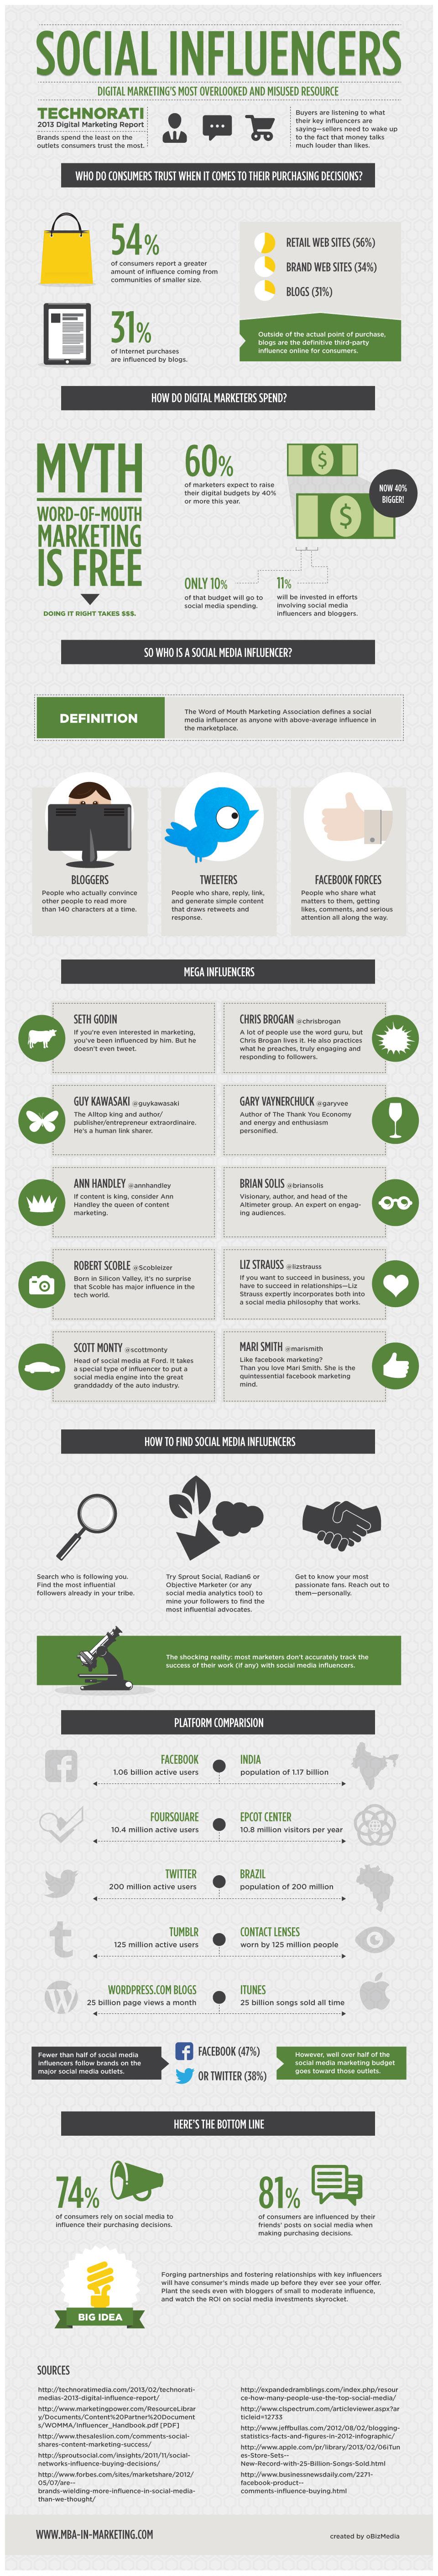 social_influencer_infographic.jpg